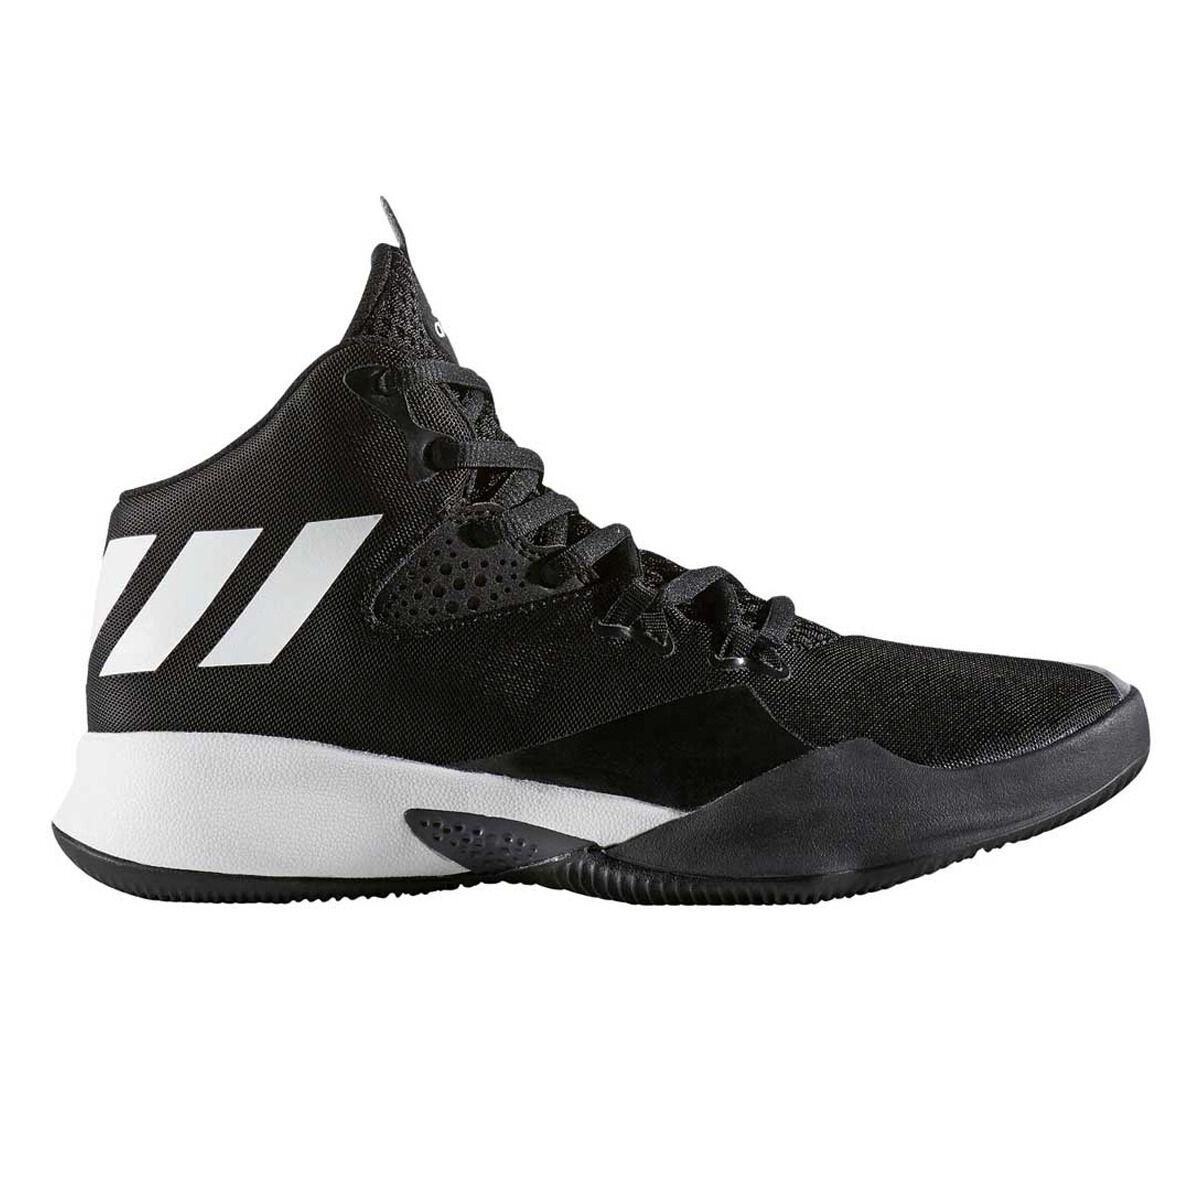 2b3a69cfcf22 ... discount adidas dual threat junior basketball shoes black white us 6  black white d79cf 3fbde